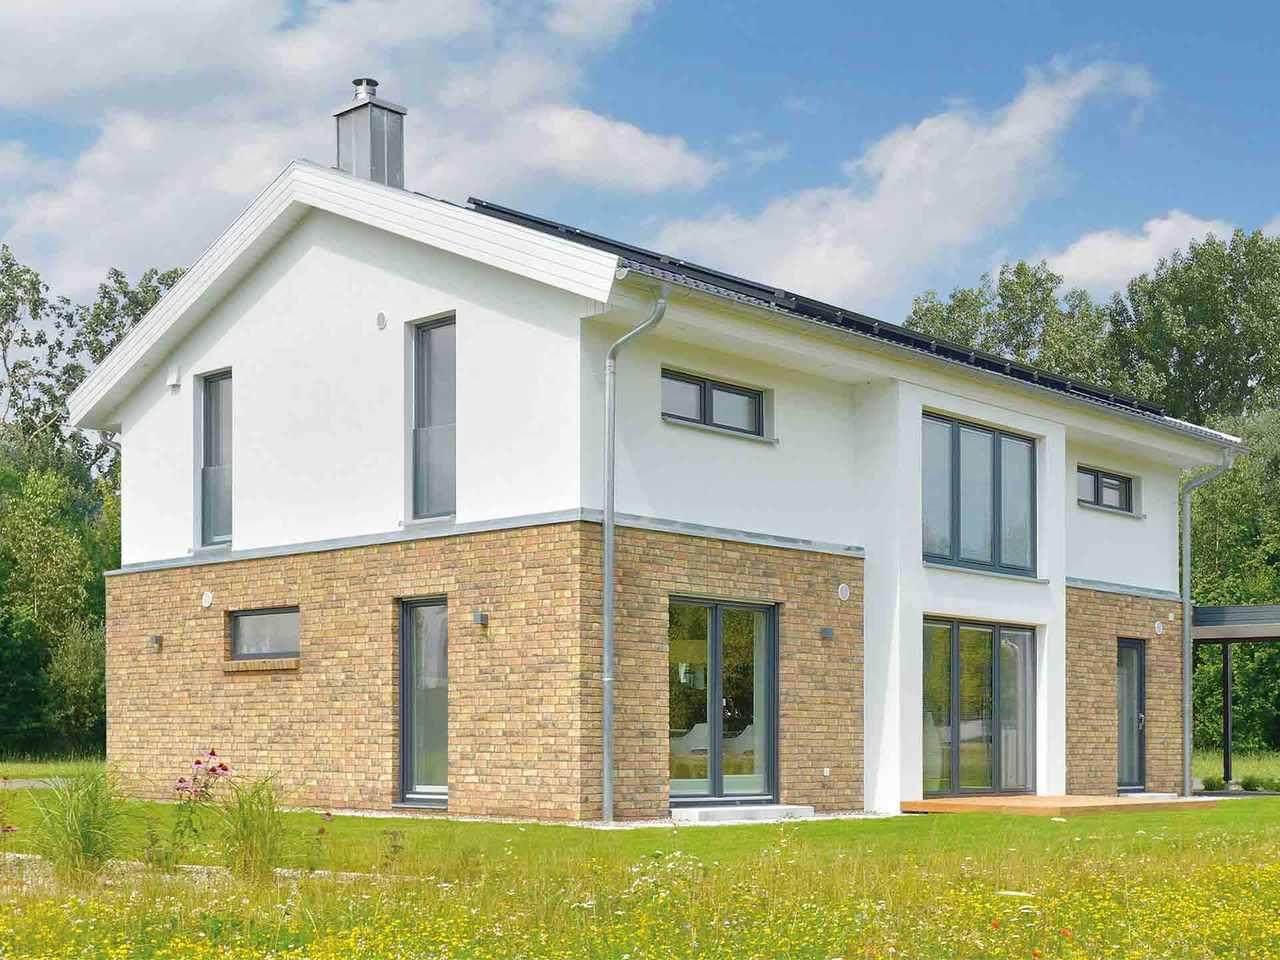 Musterhaus Kronshagen - Danhaus